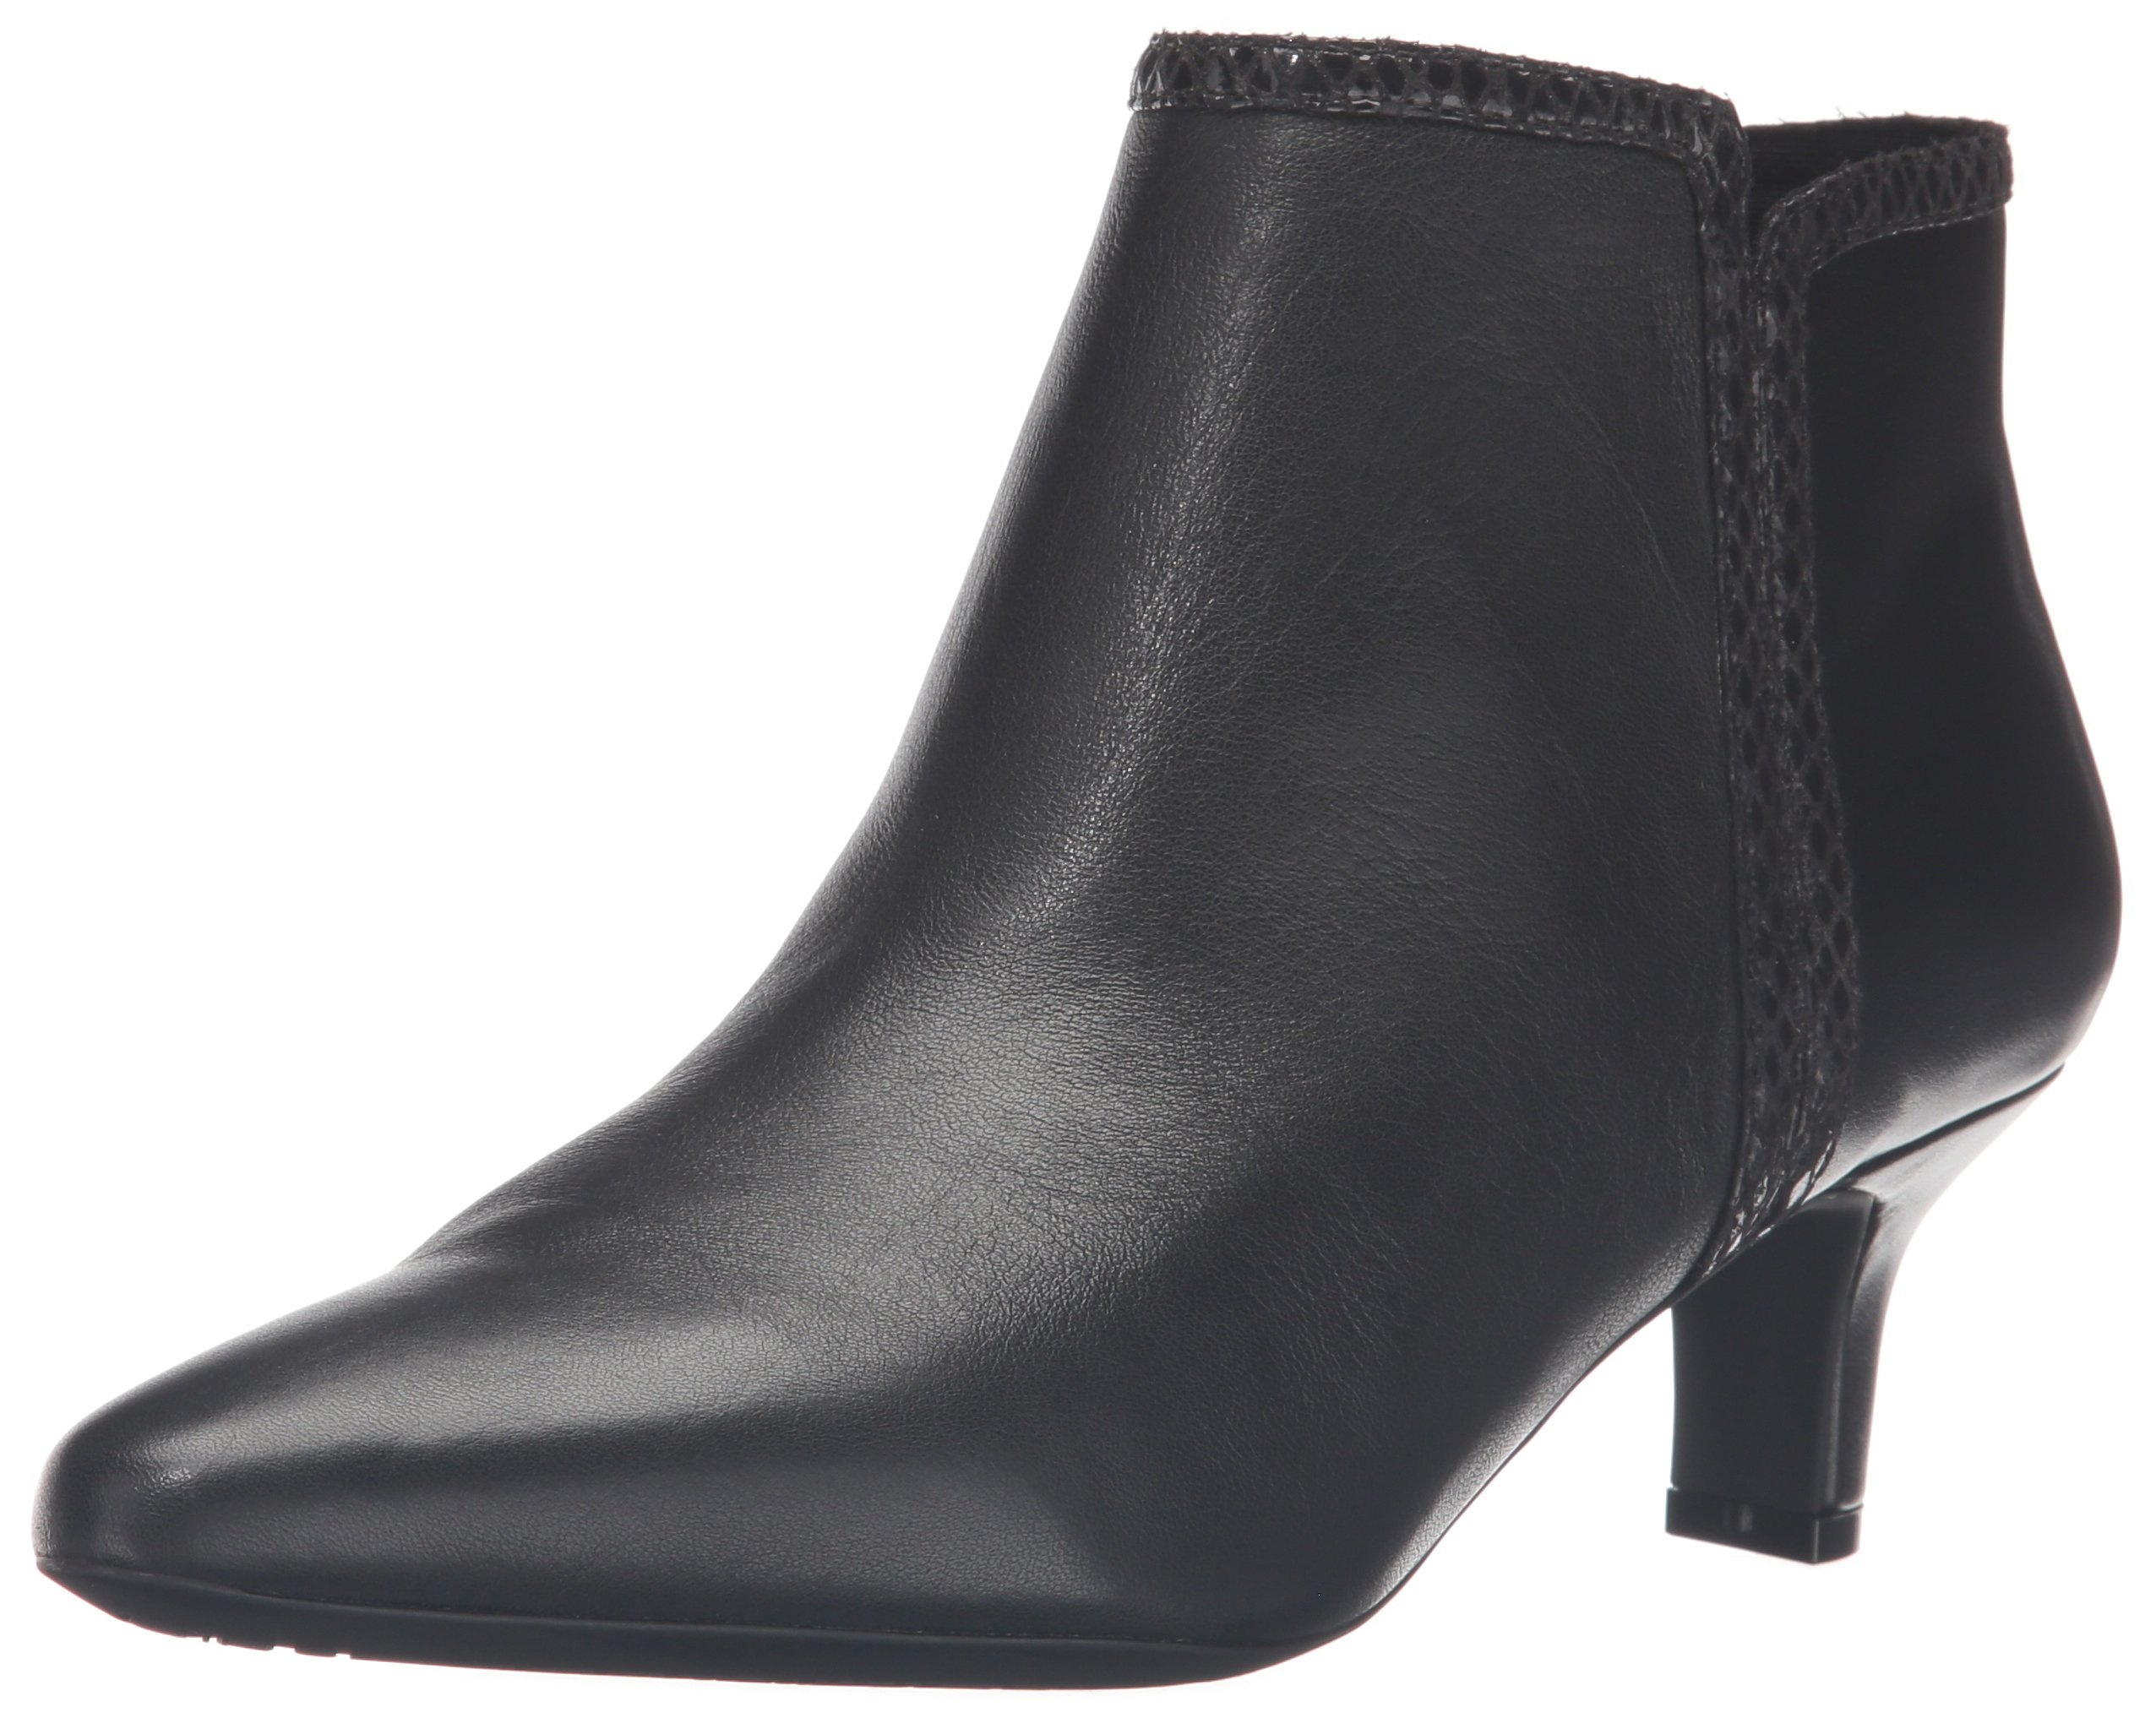 Rockport Women's Kimly Ankle Bootie, Black Leather, 8.5 W (C)